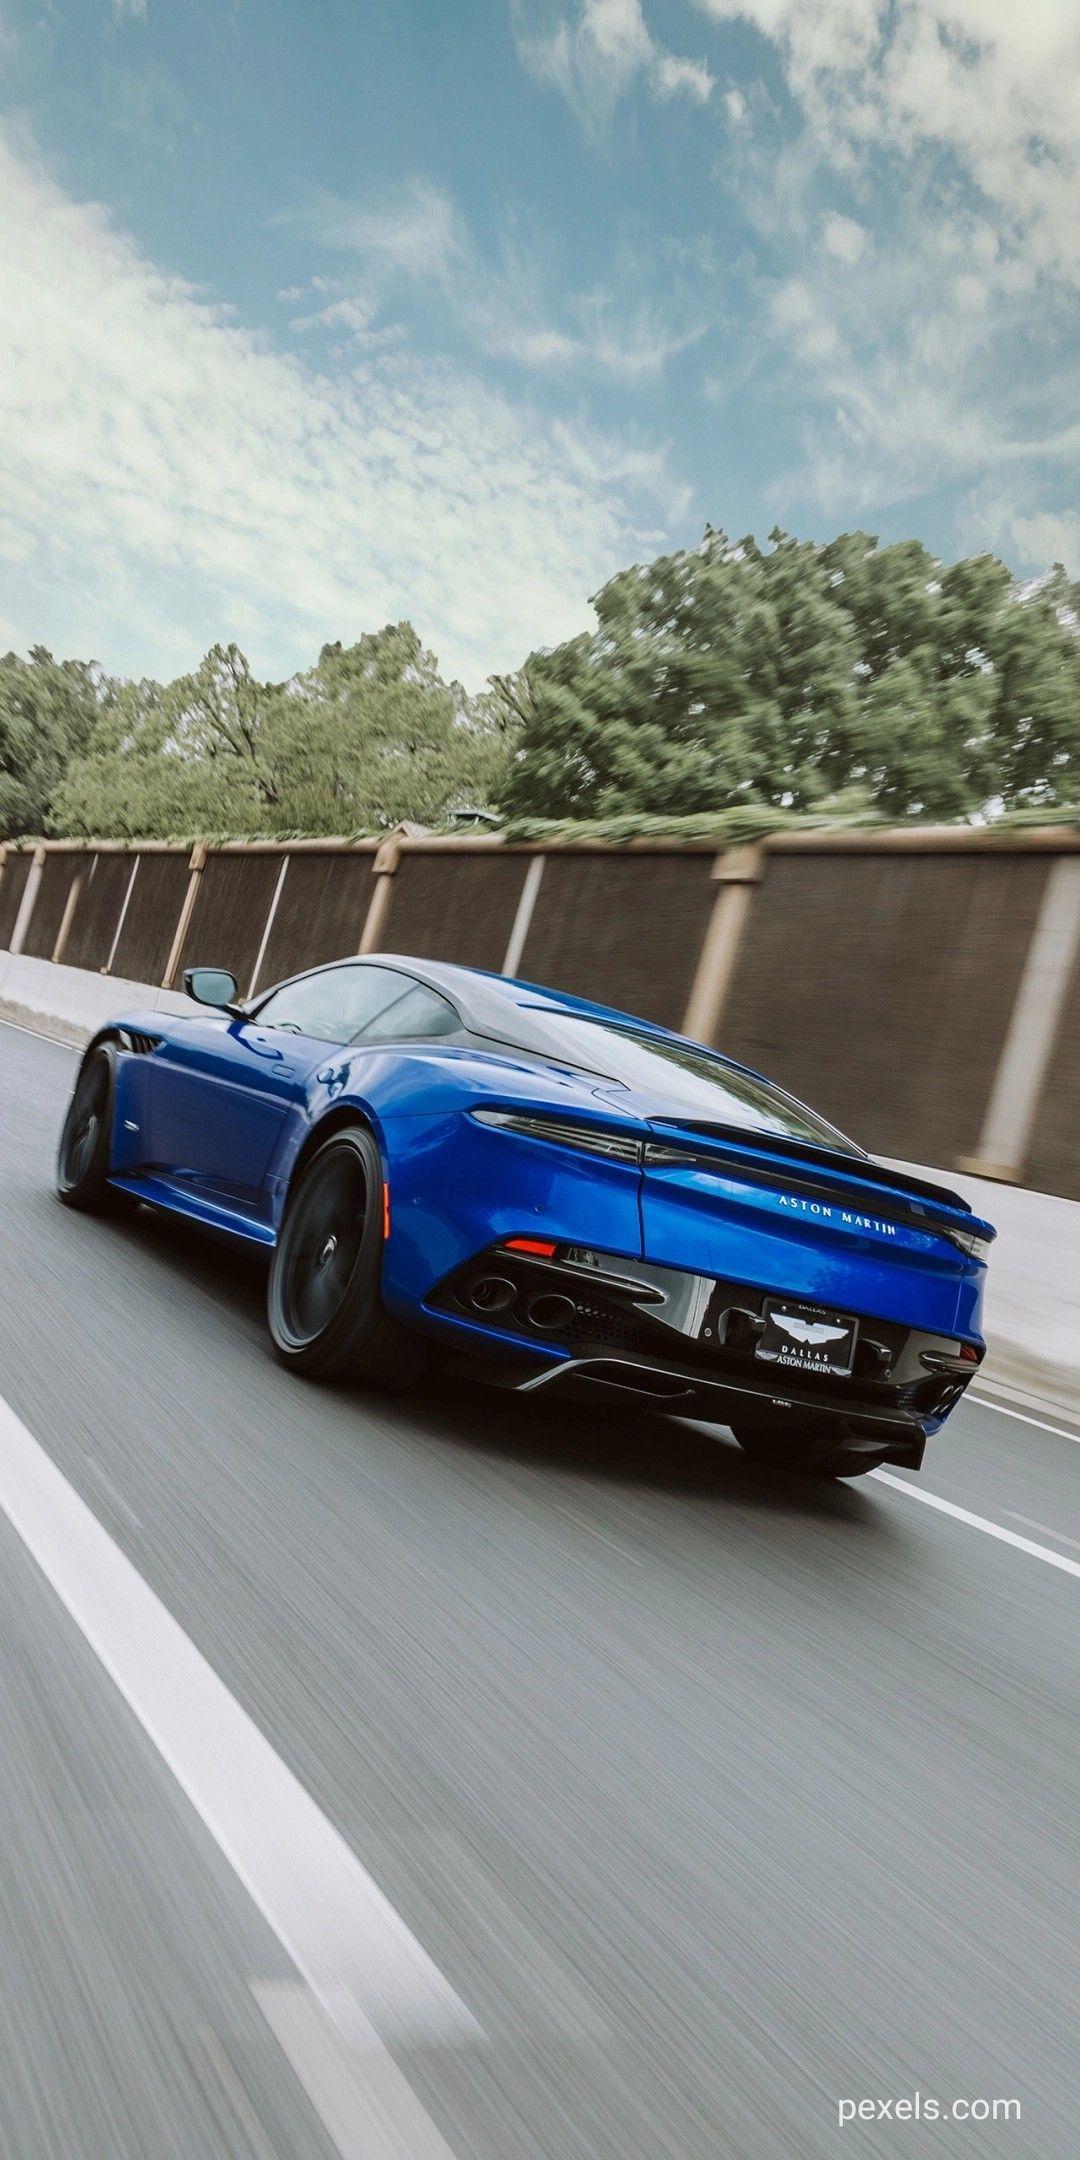 Future Tech Aston Martin Wallpaper Iphone Aston Martin Wallpaper Iphone Aston Martin Db5 James Bond Aston Martin Aston Martin Dbs Aston Martin Vulcan